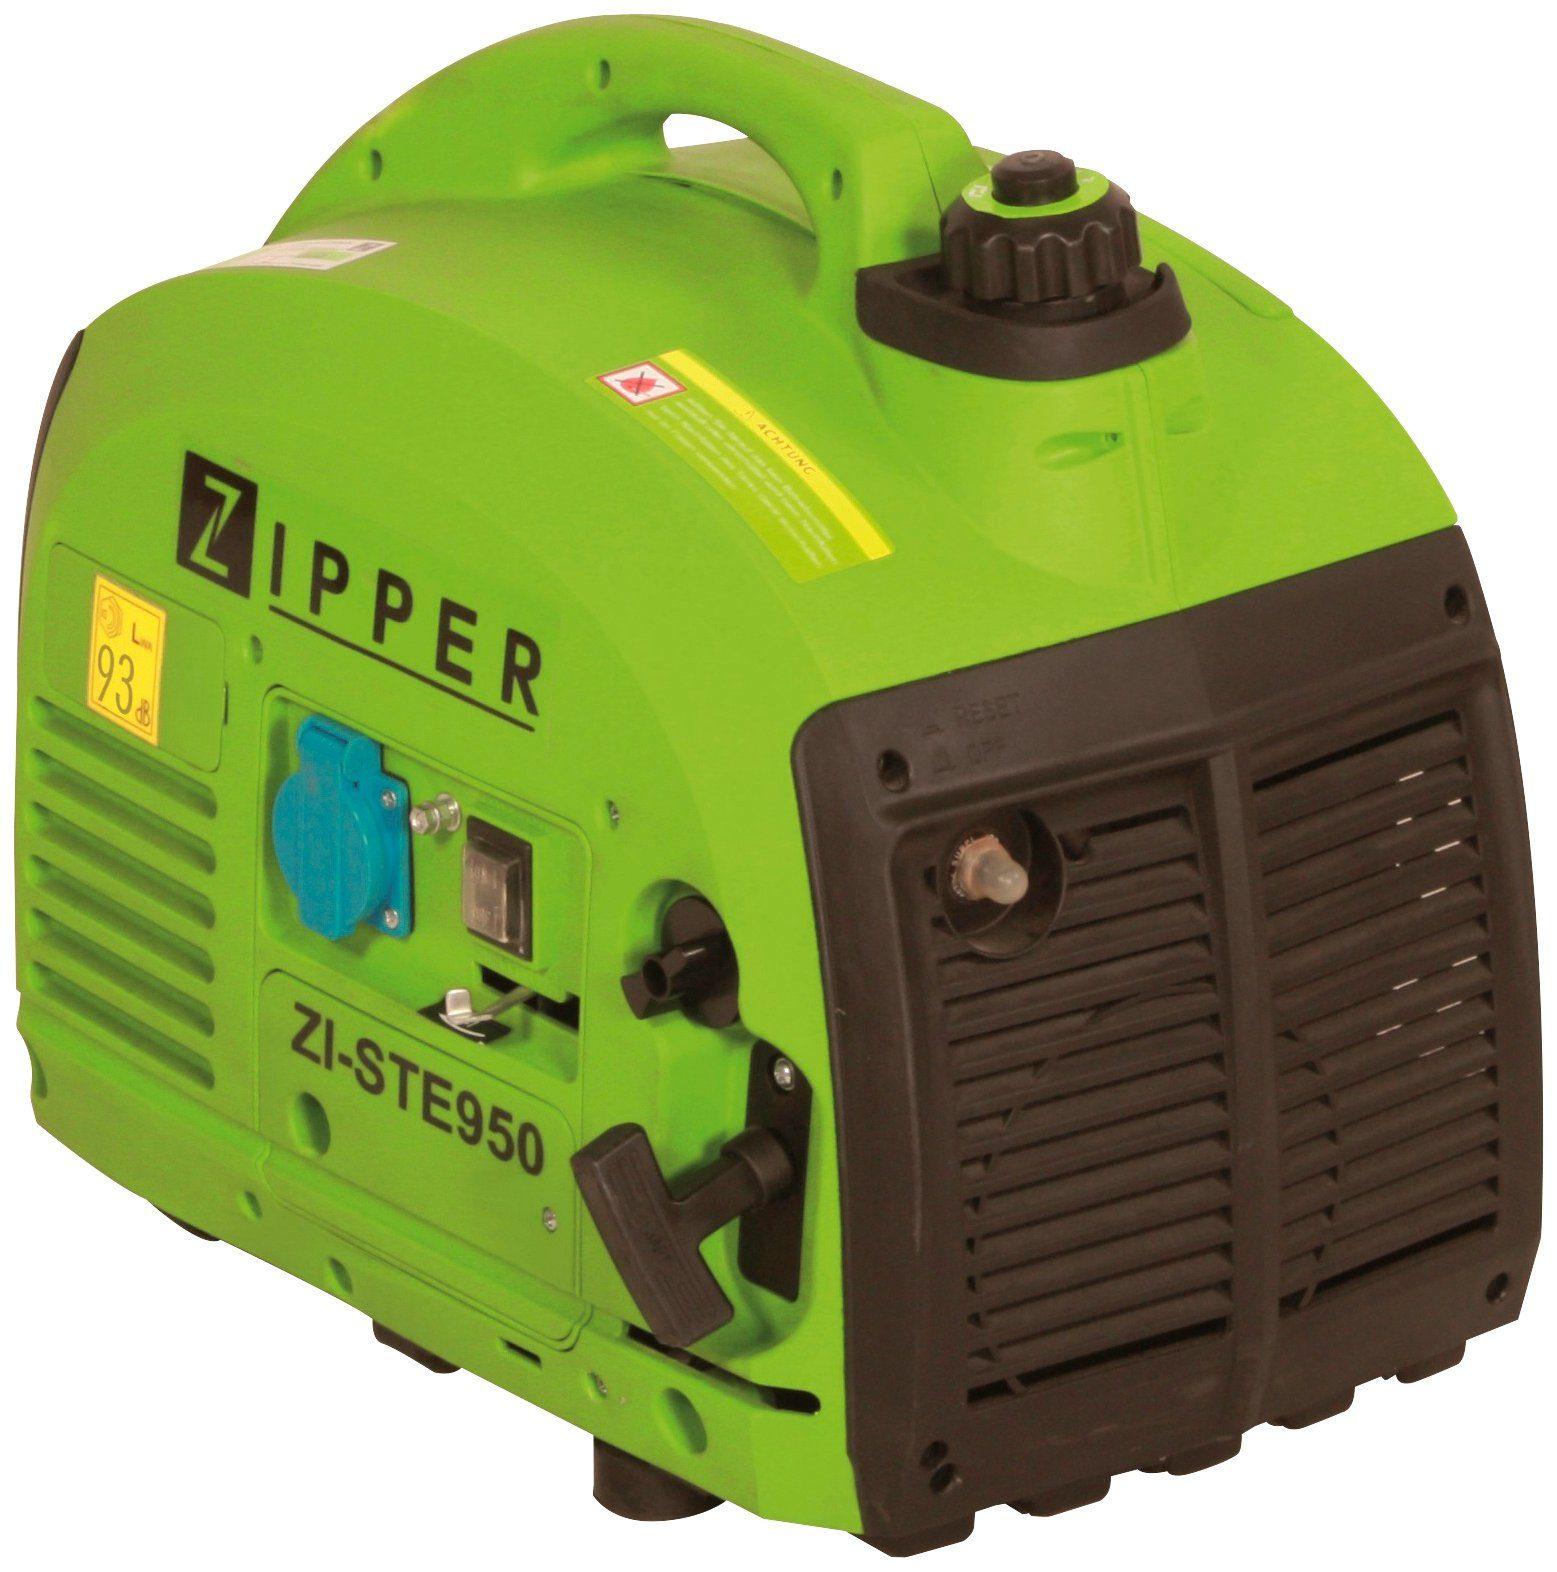 Zipper Stromerzeuger »ZI-STE950A« mit 1 x 230 V-Steckdose (50 Hz)